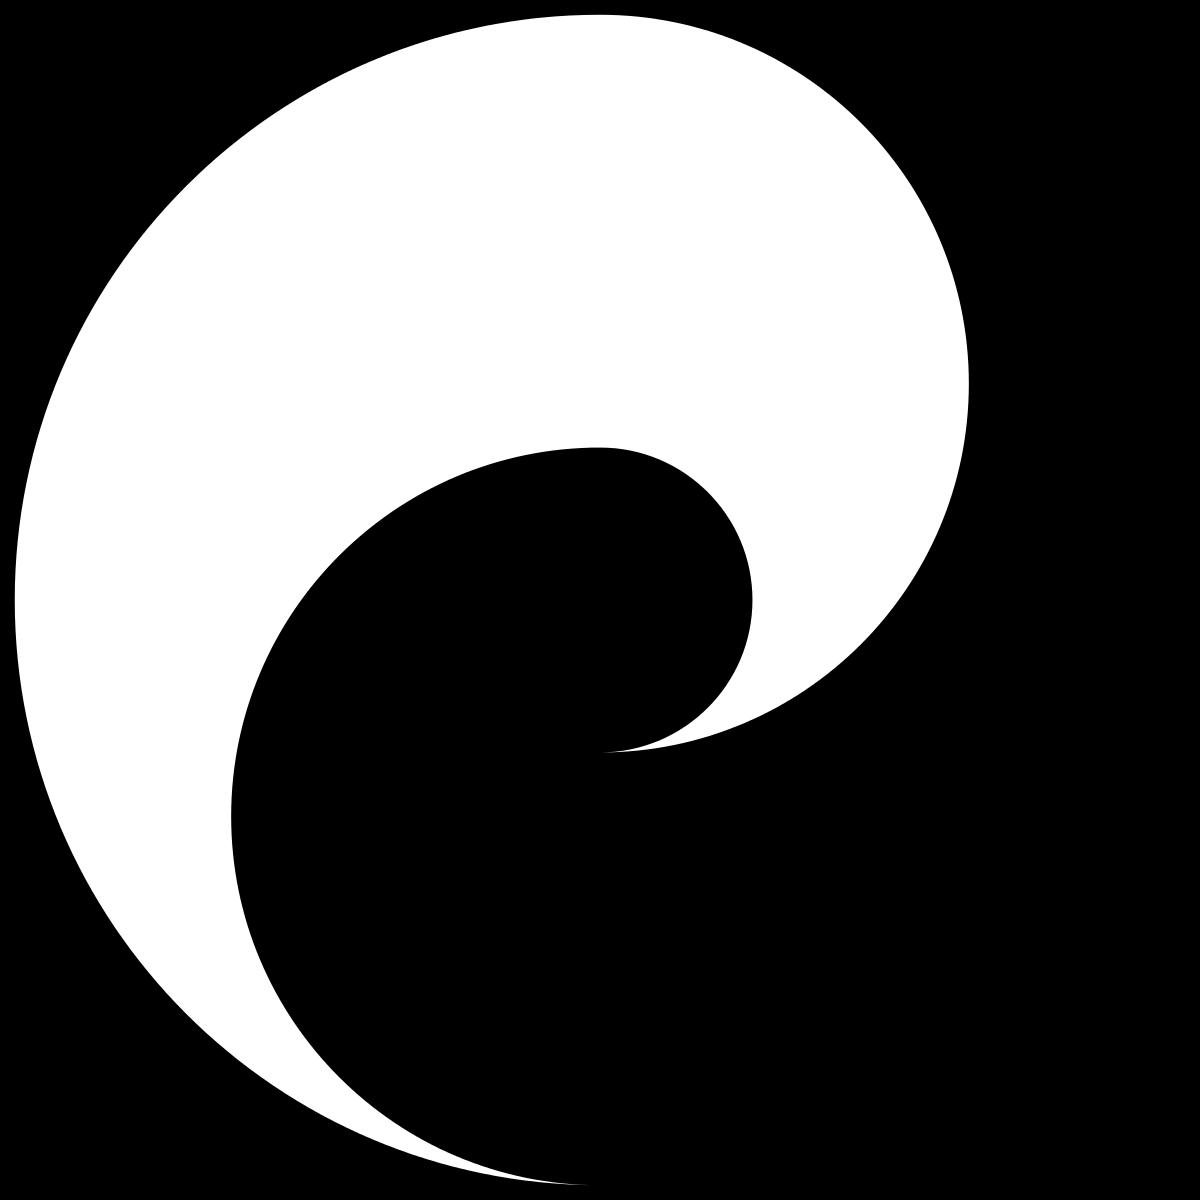 Mystery wikiquote . Thumb clipart sideways